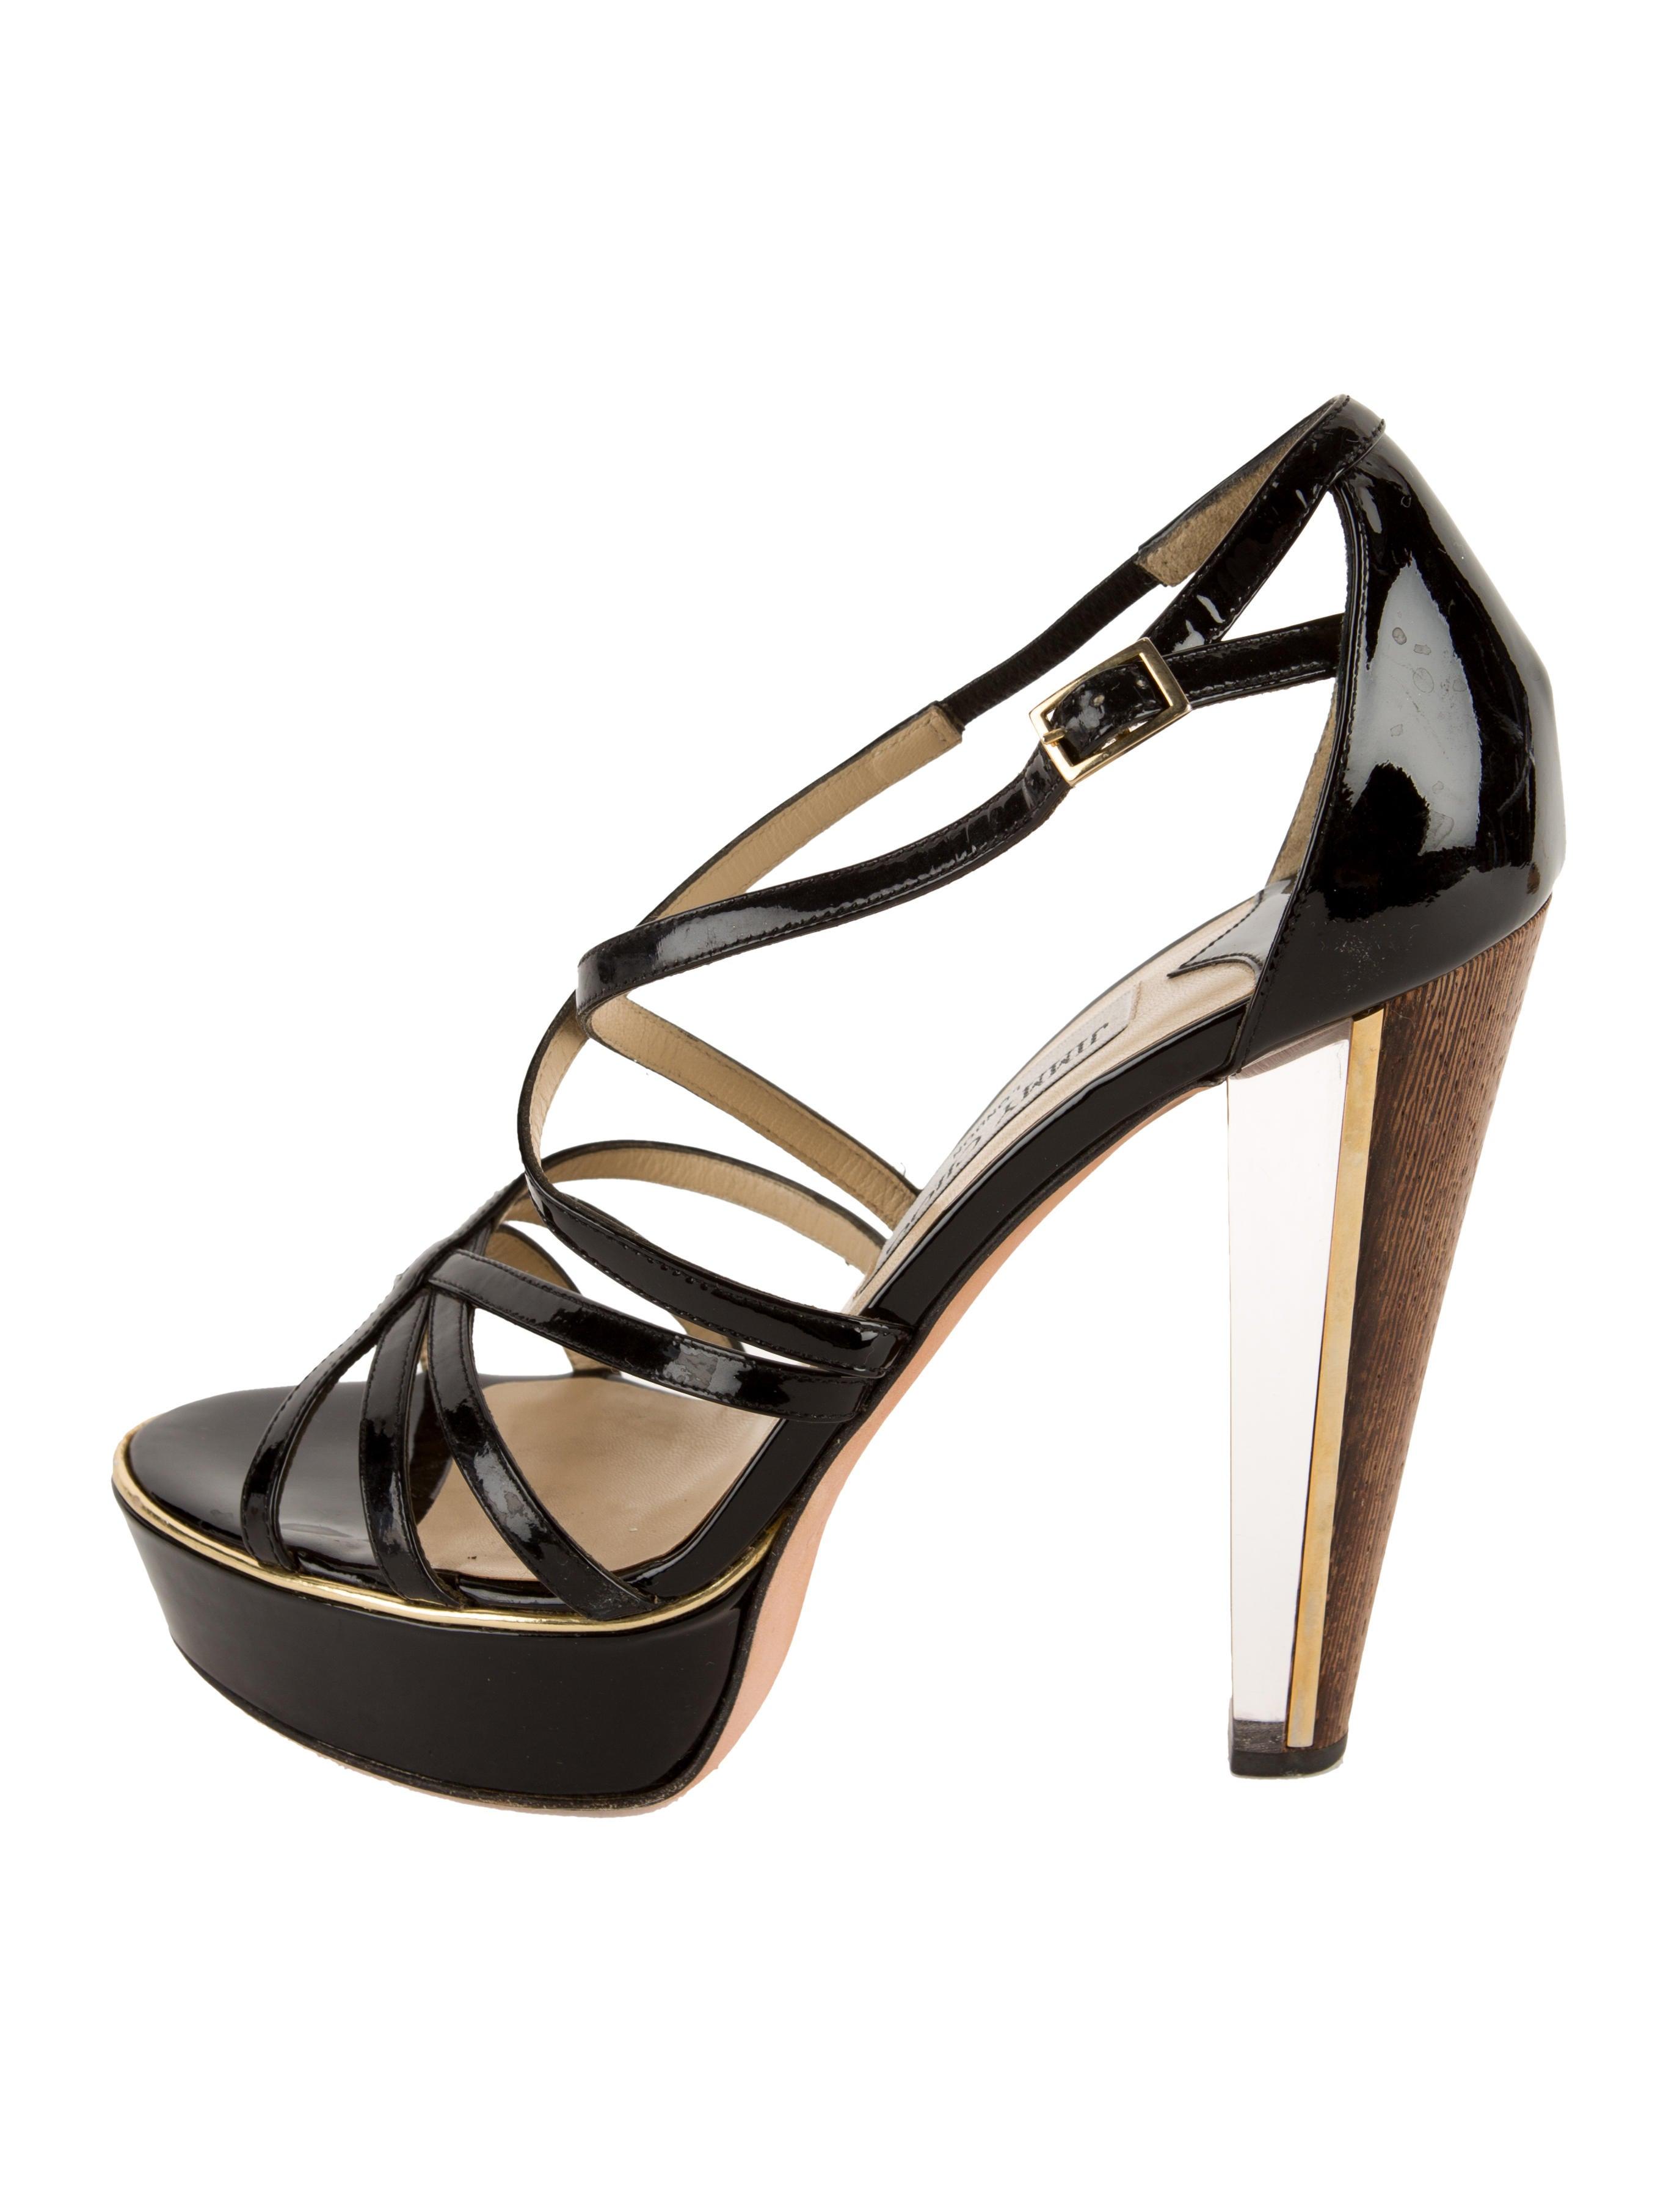 jimmy choo patent leather platform sandals shoes